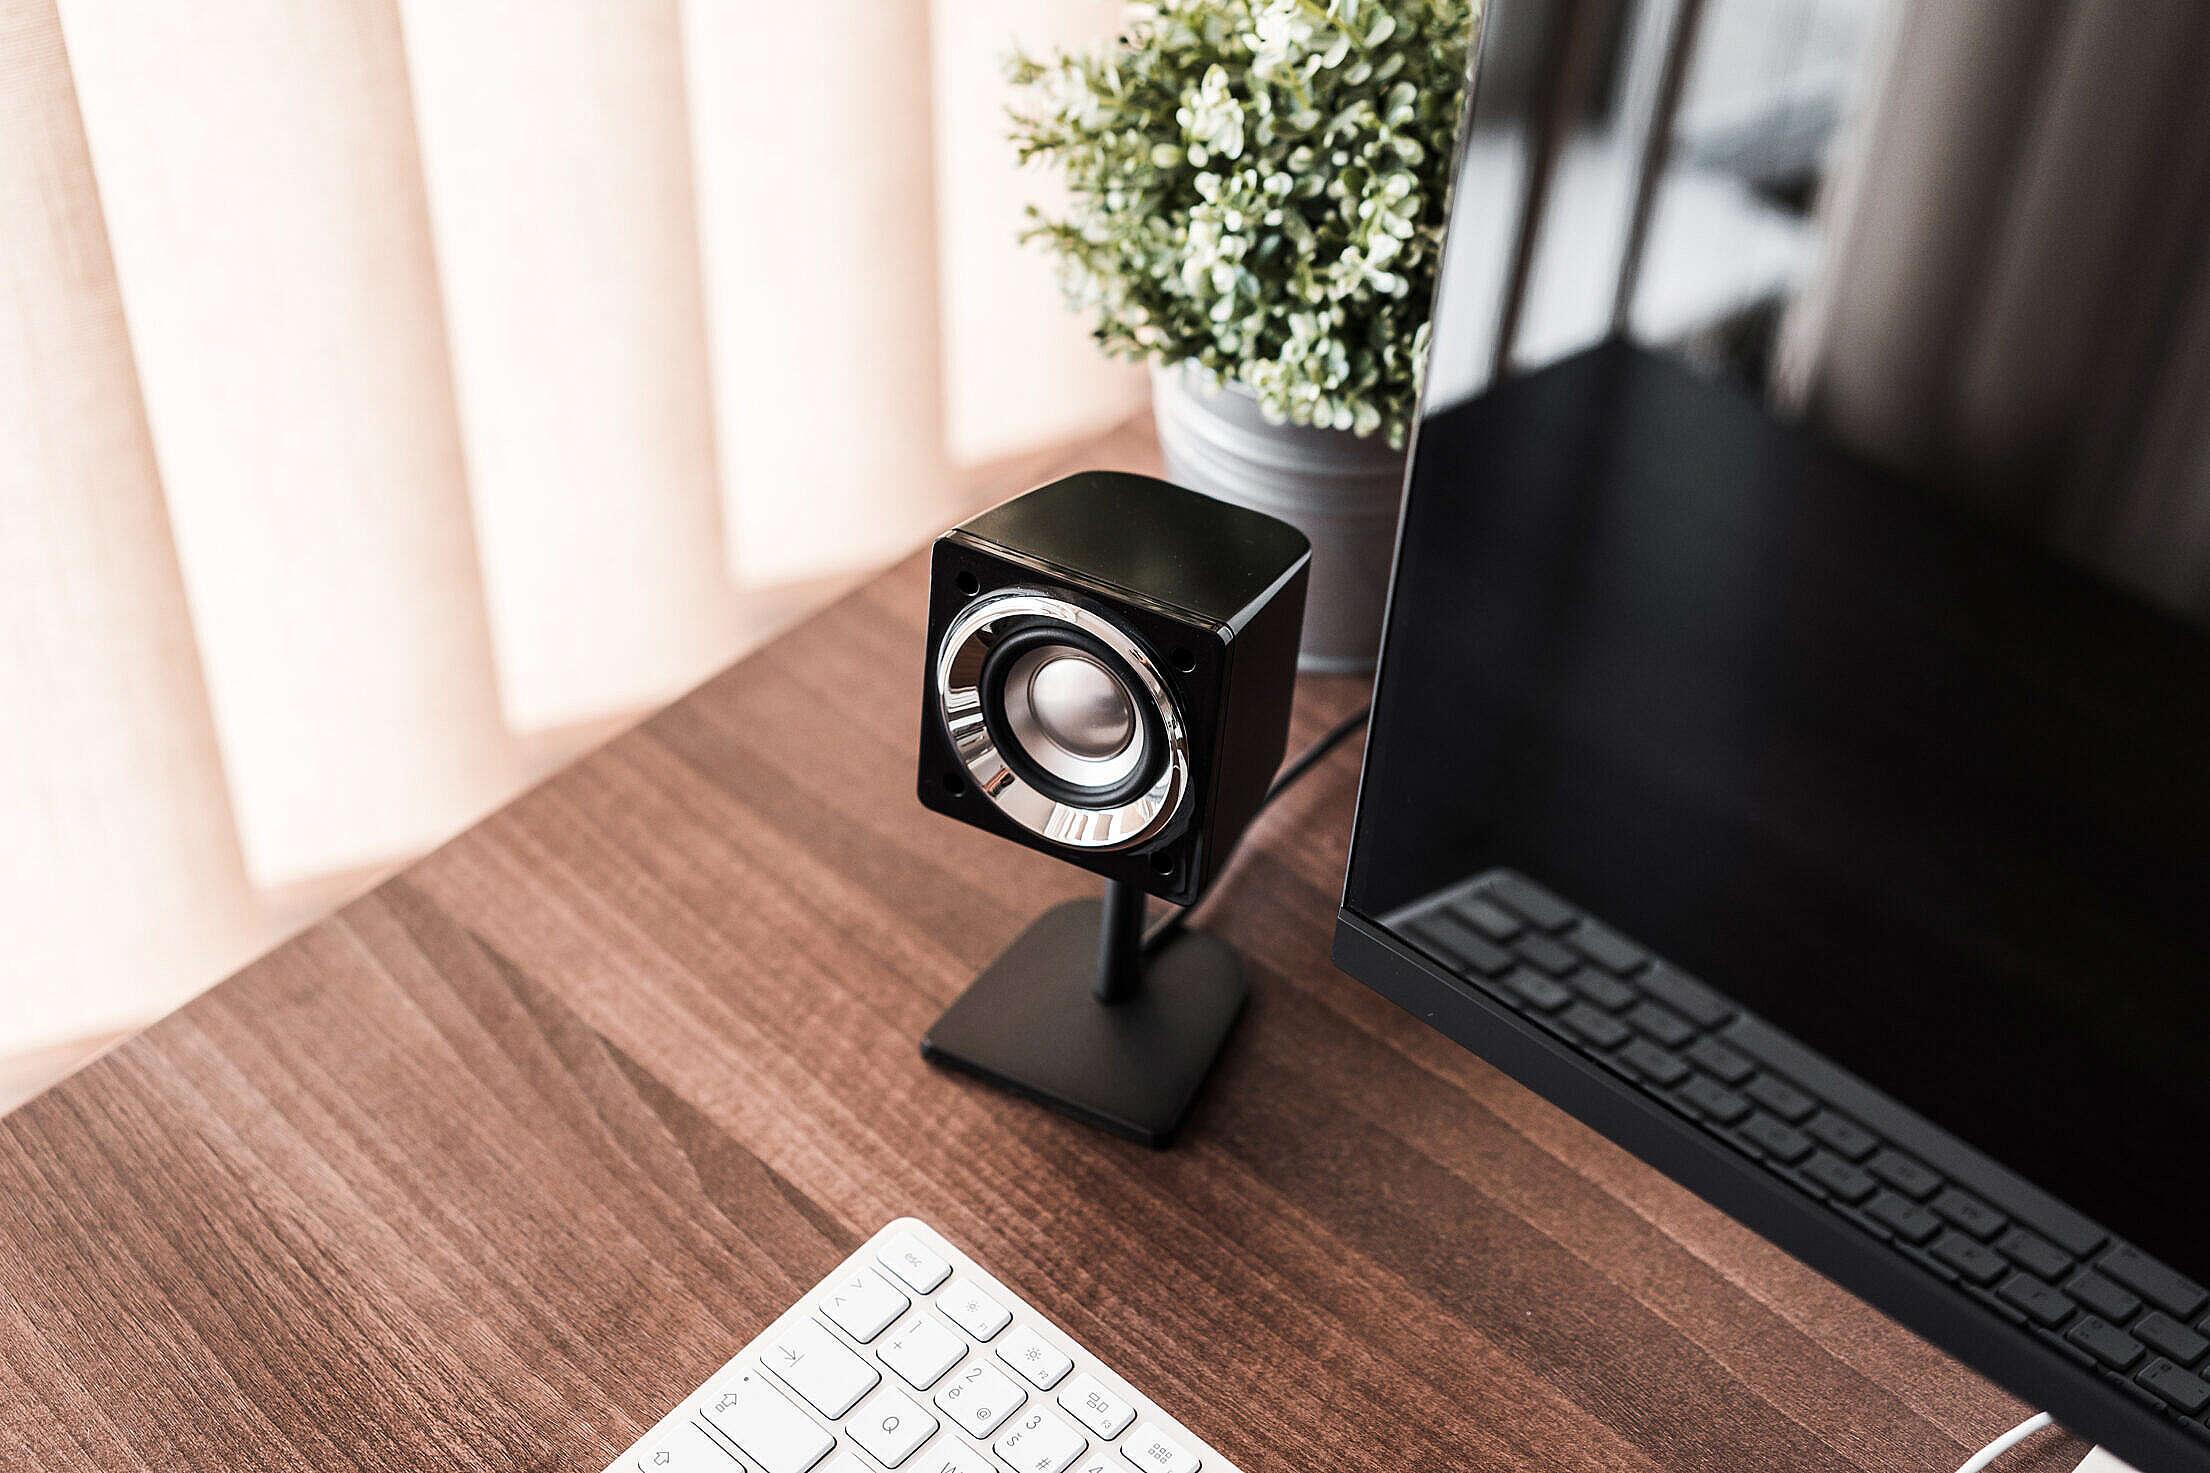 Computer Speaker and Desktop Setup Free Stock Photo